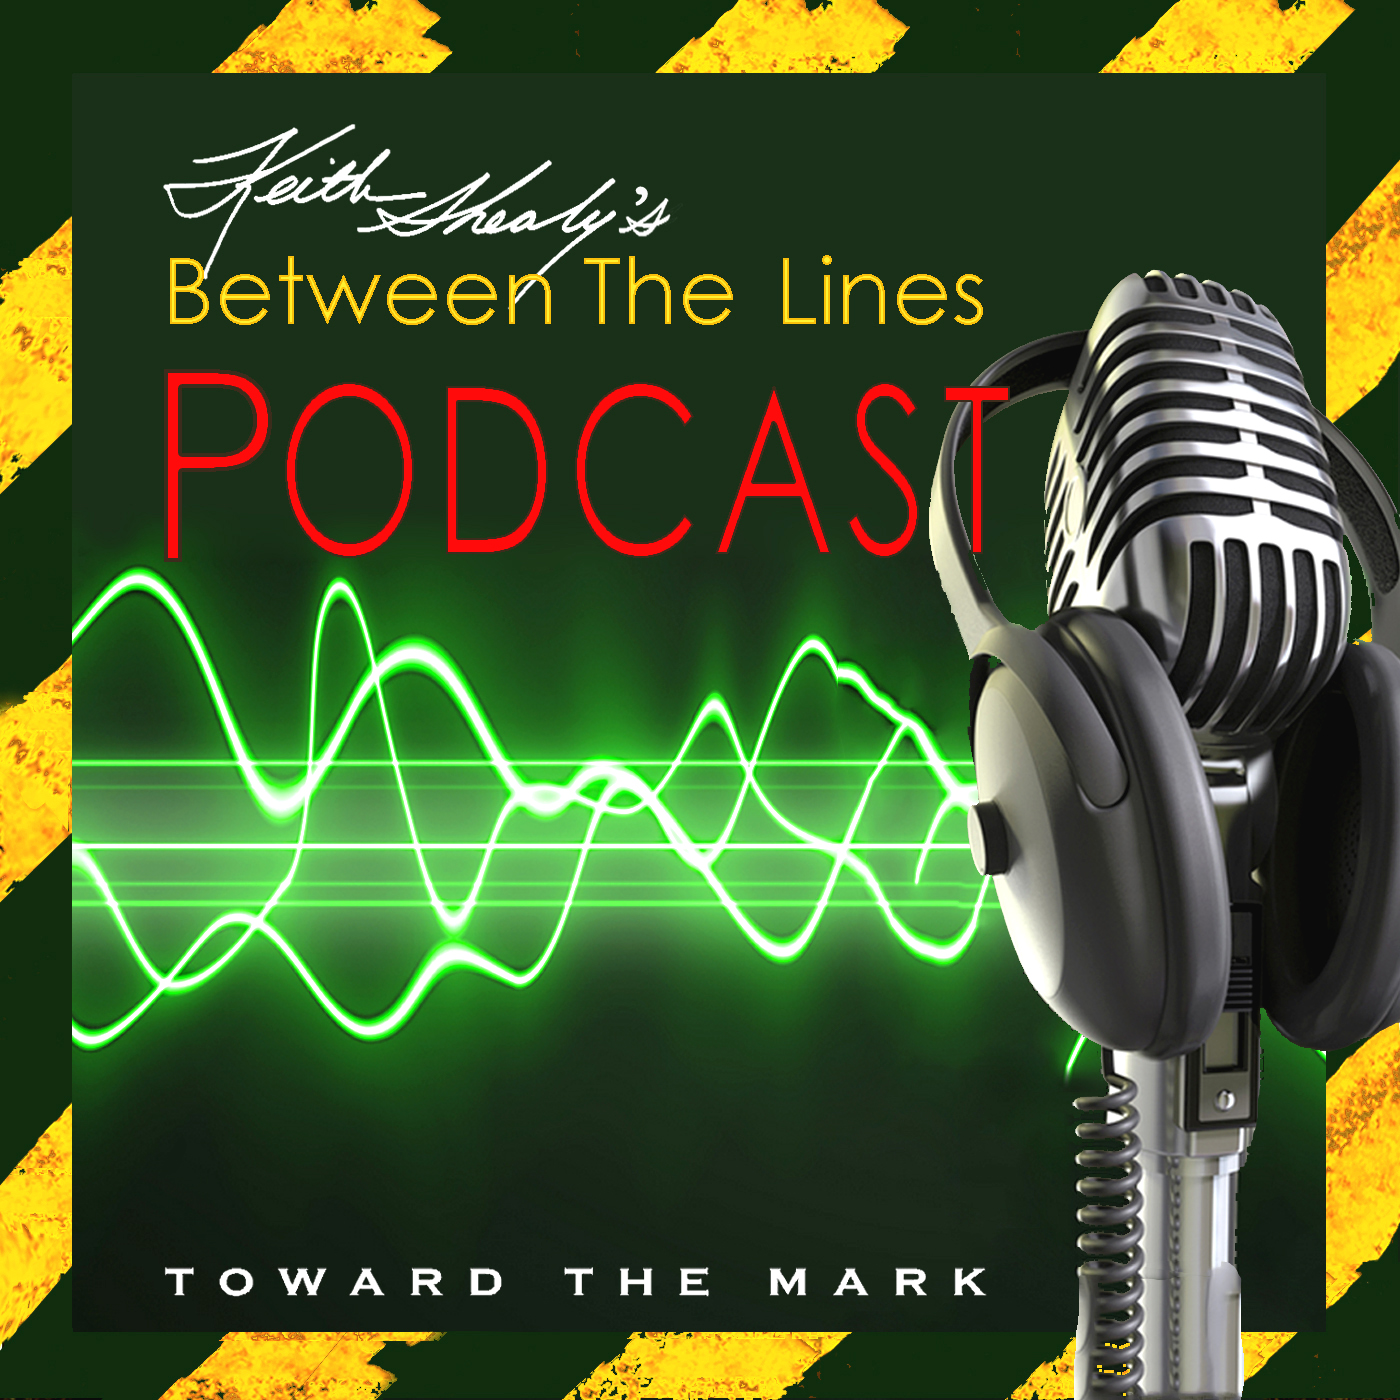 KeithShealy'sBetweenTheLines podcast logo